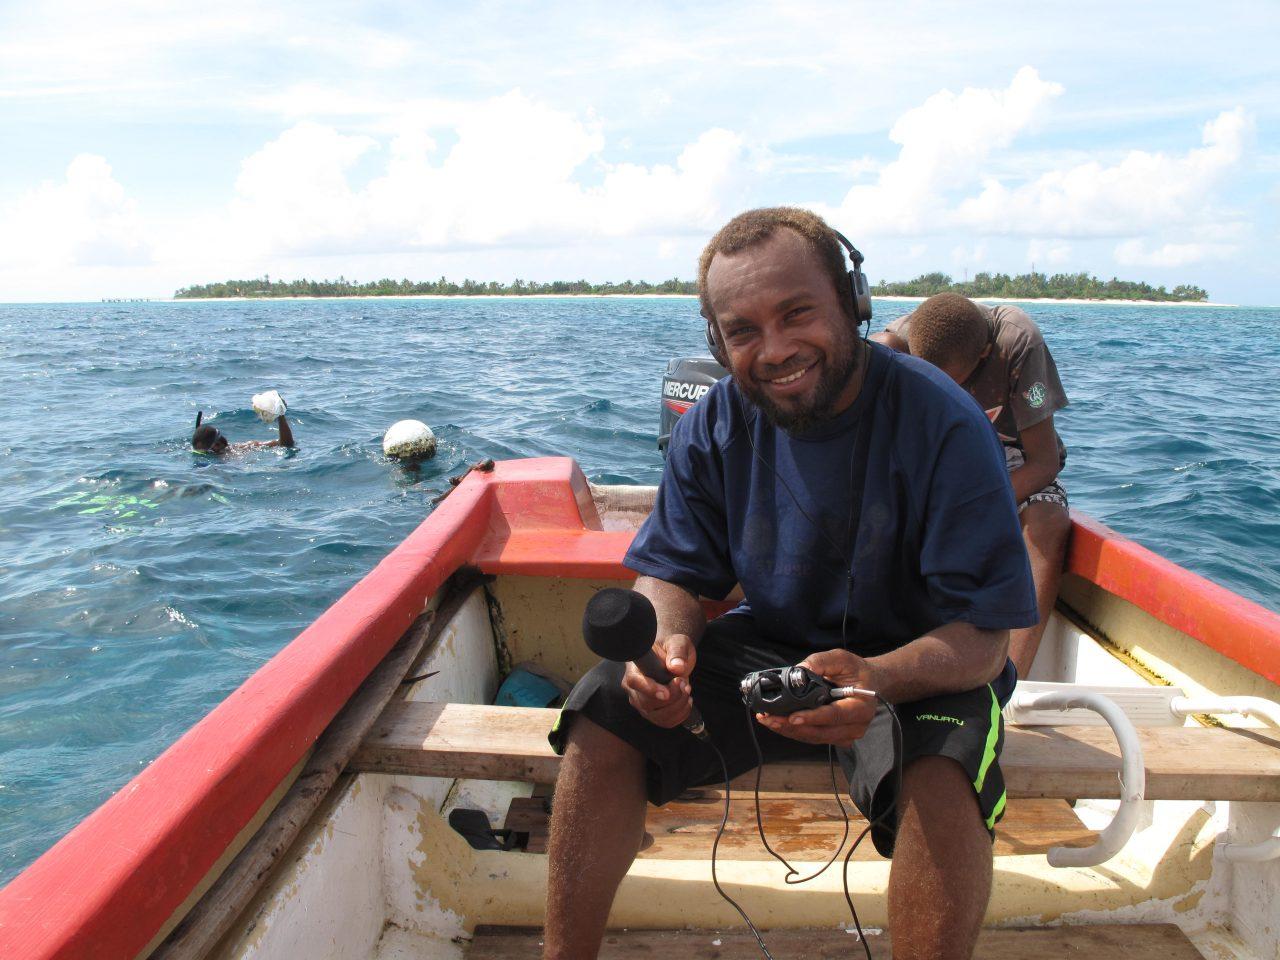 Demystifying making radio: AKA Mystery Island